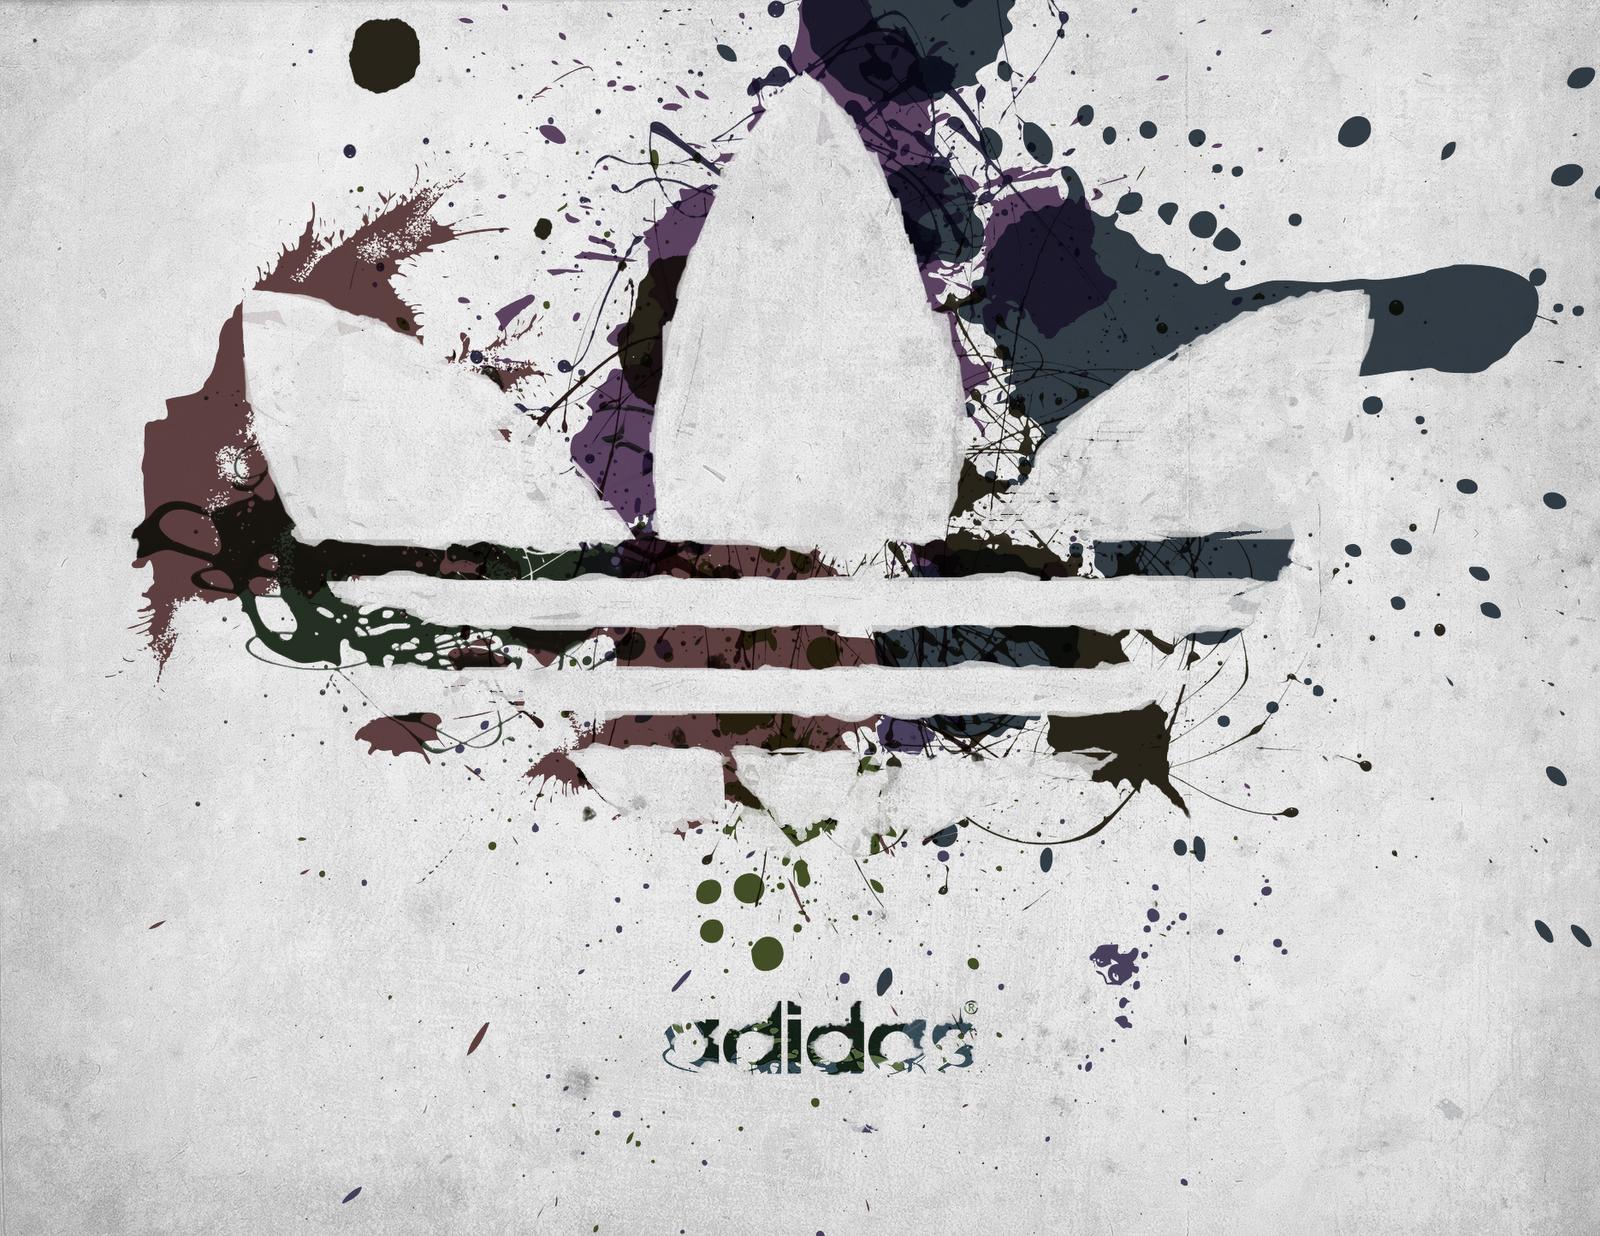 http://3.bp.blogspot.com/-0eeYxoU6RFU/UFhpDpgJVjI/AAAAAAAAAao/k03r8nBGXrE/s1600/Adidas_originals_logo_design_inspired.jpg